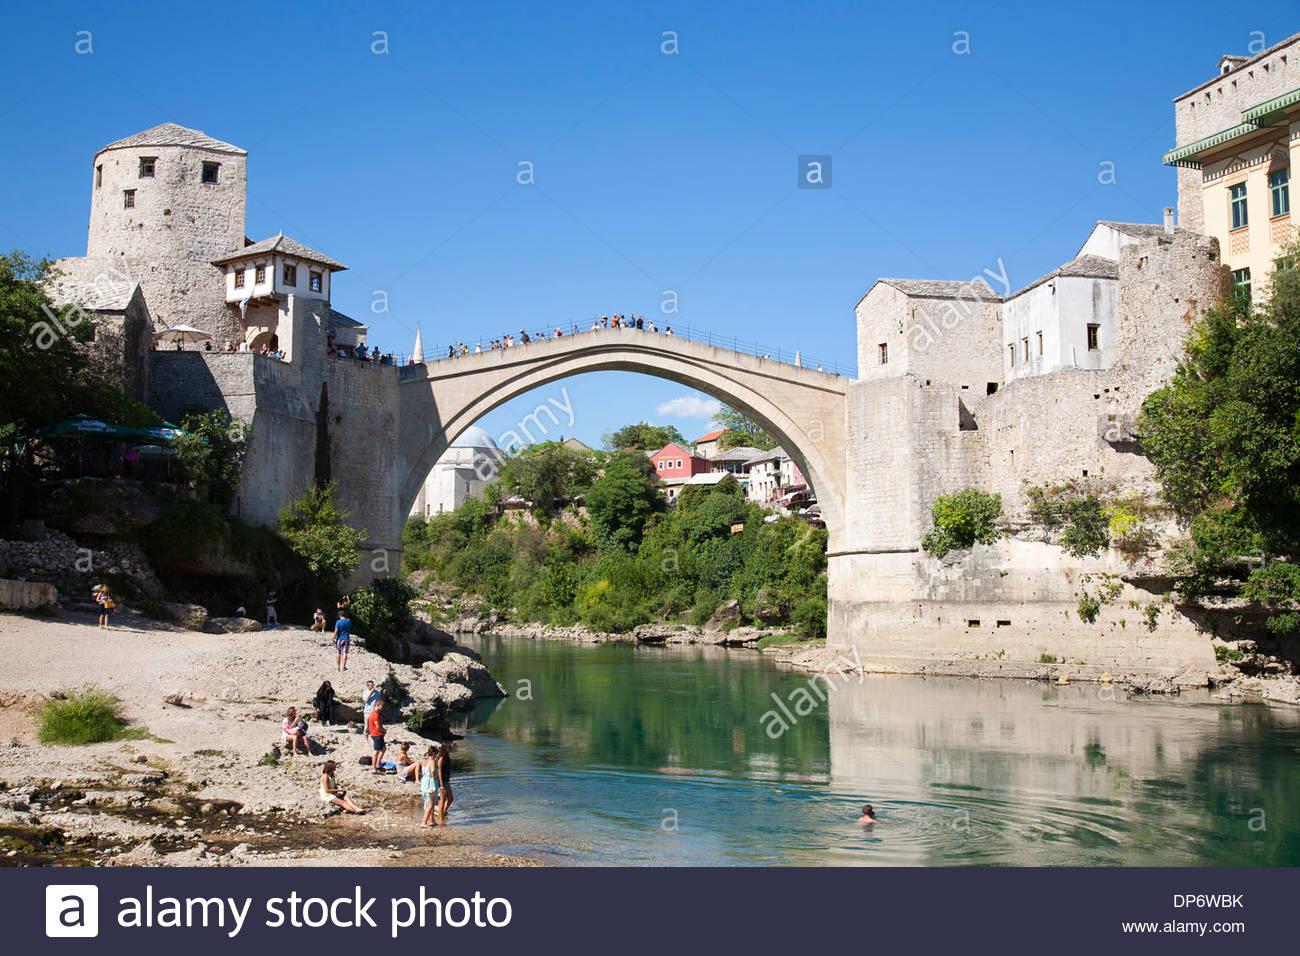 the old bridge,mostar,bosnia and herzegovina,europe Stock Photo